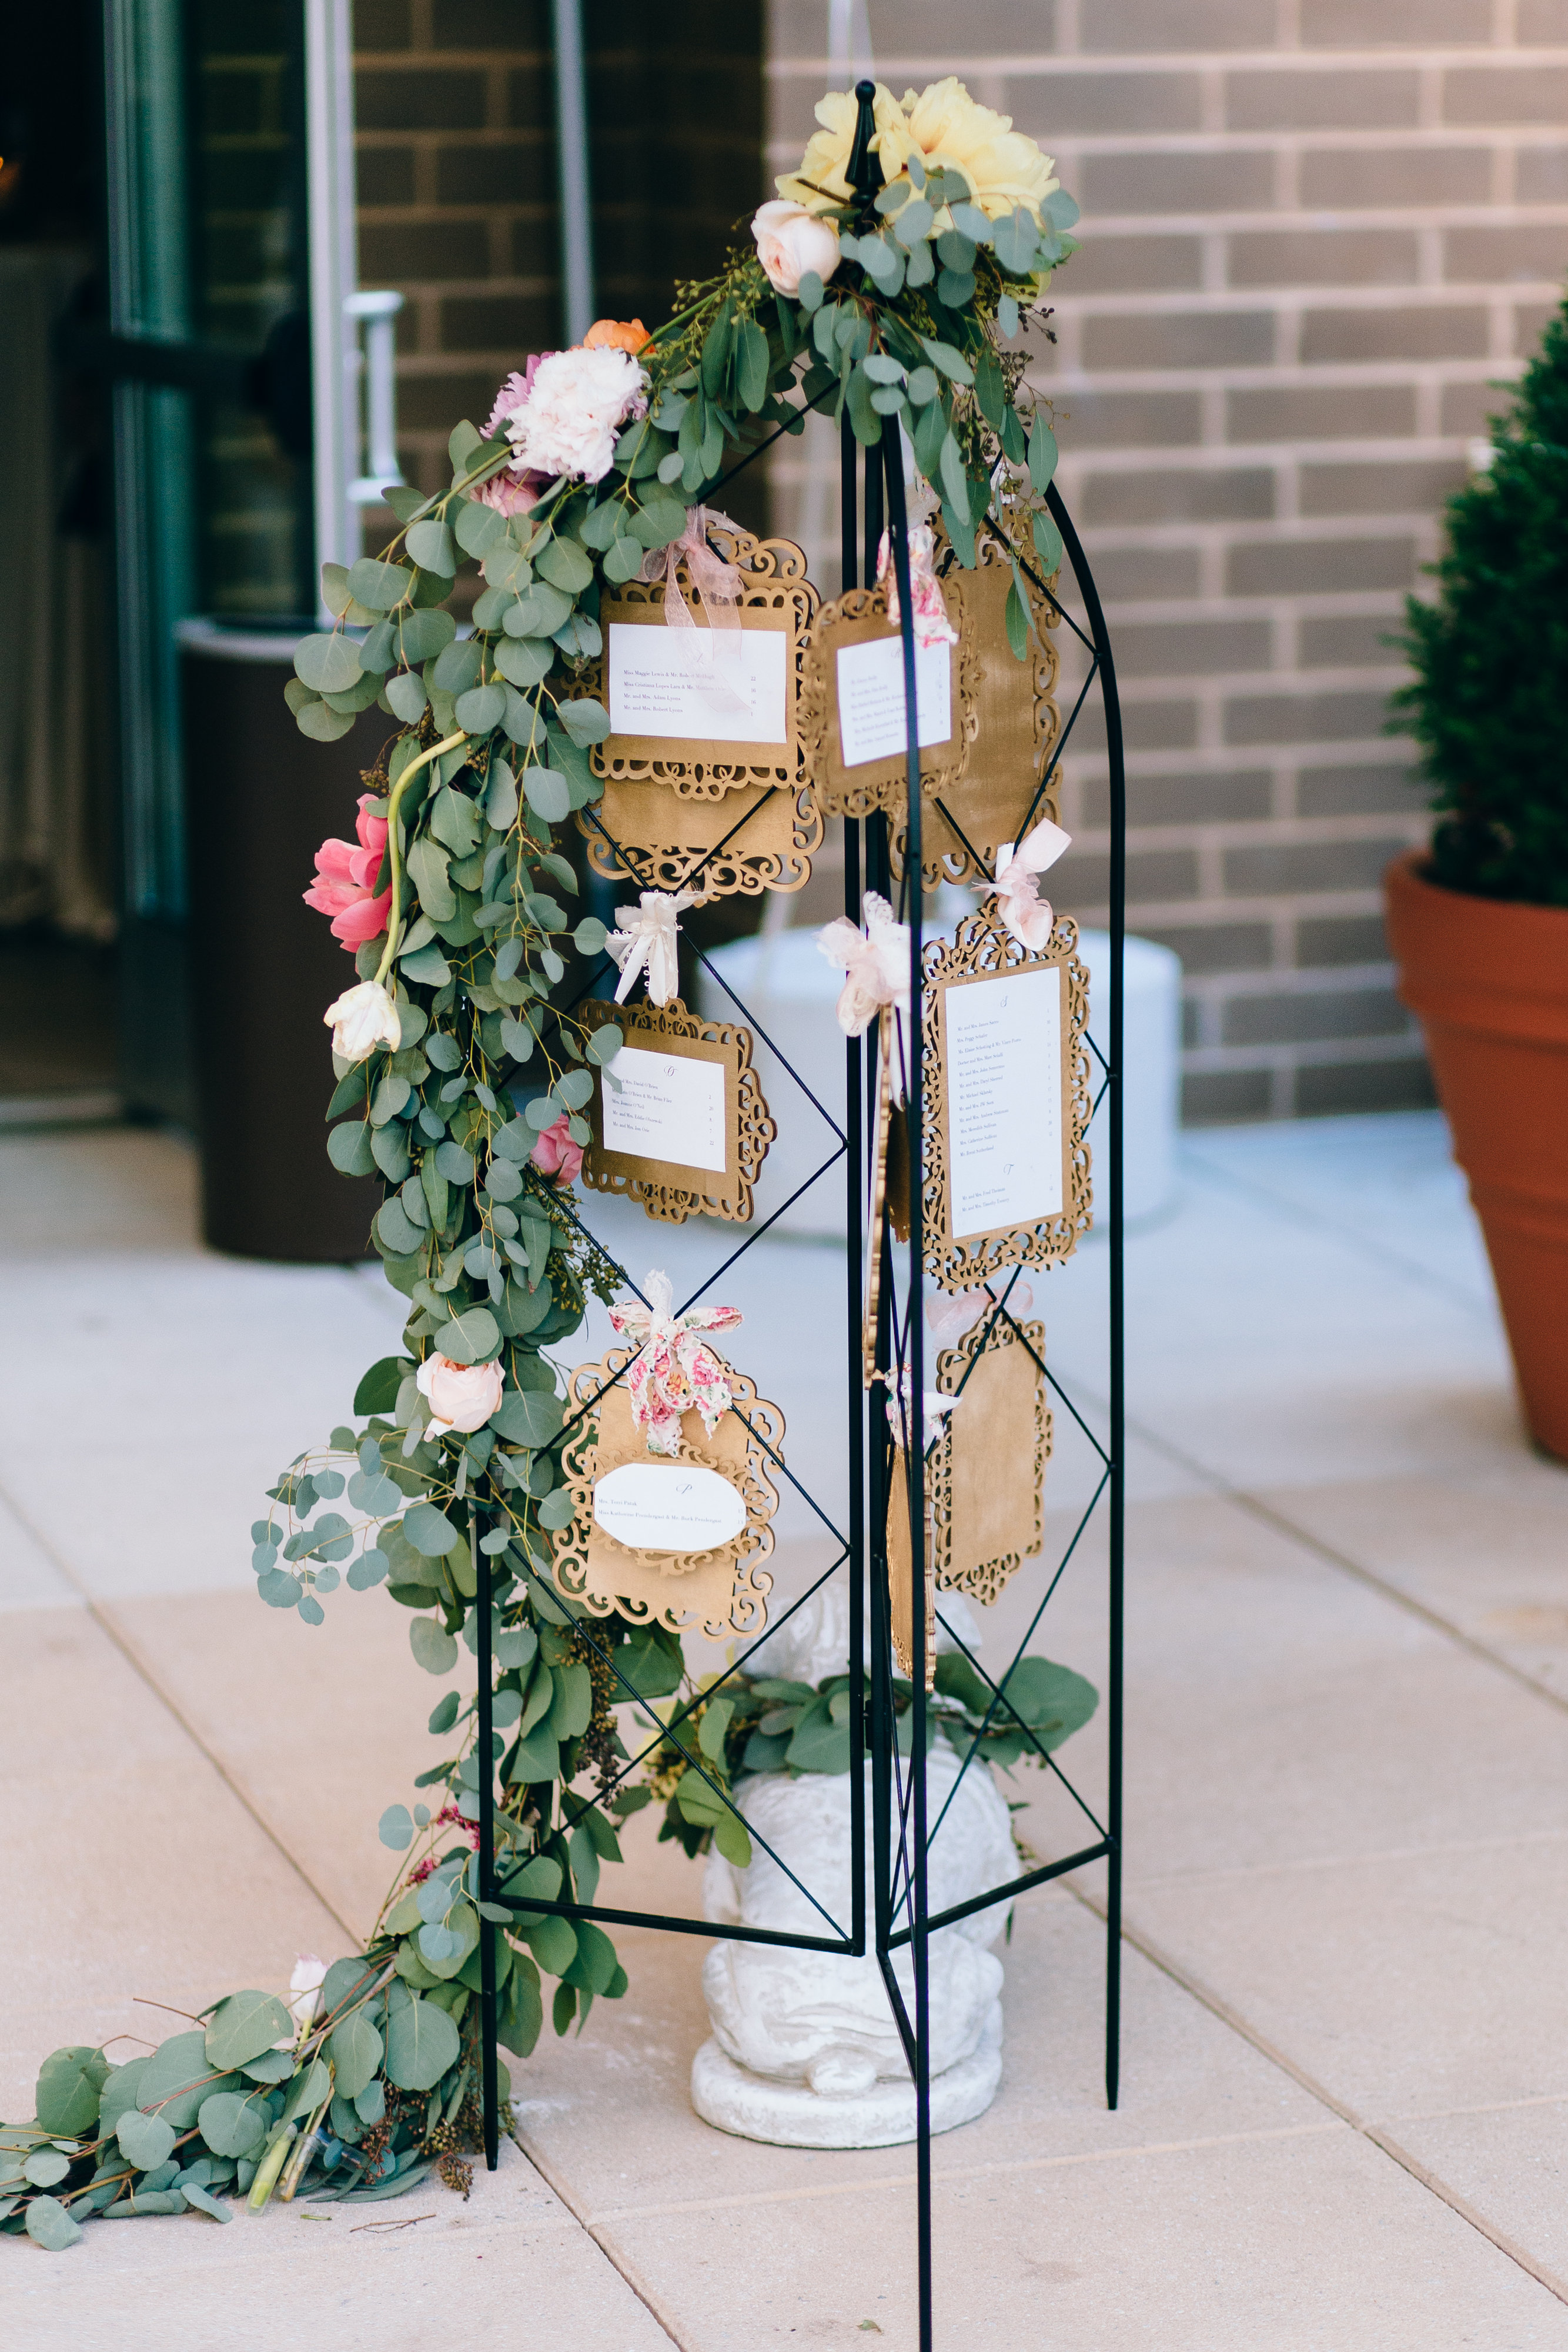 Floral Bliss - Mosaic Inc